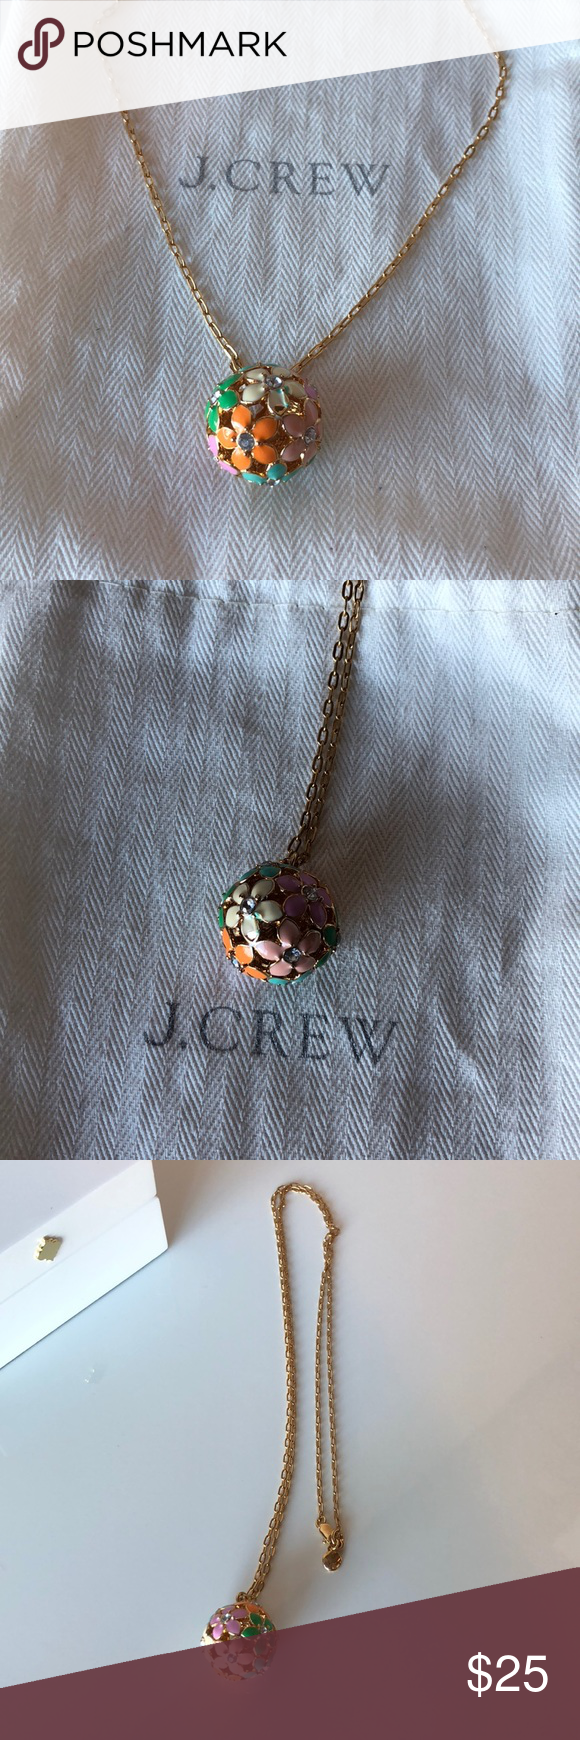 J crew floral pendant necklace my posh picks